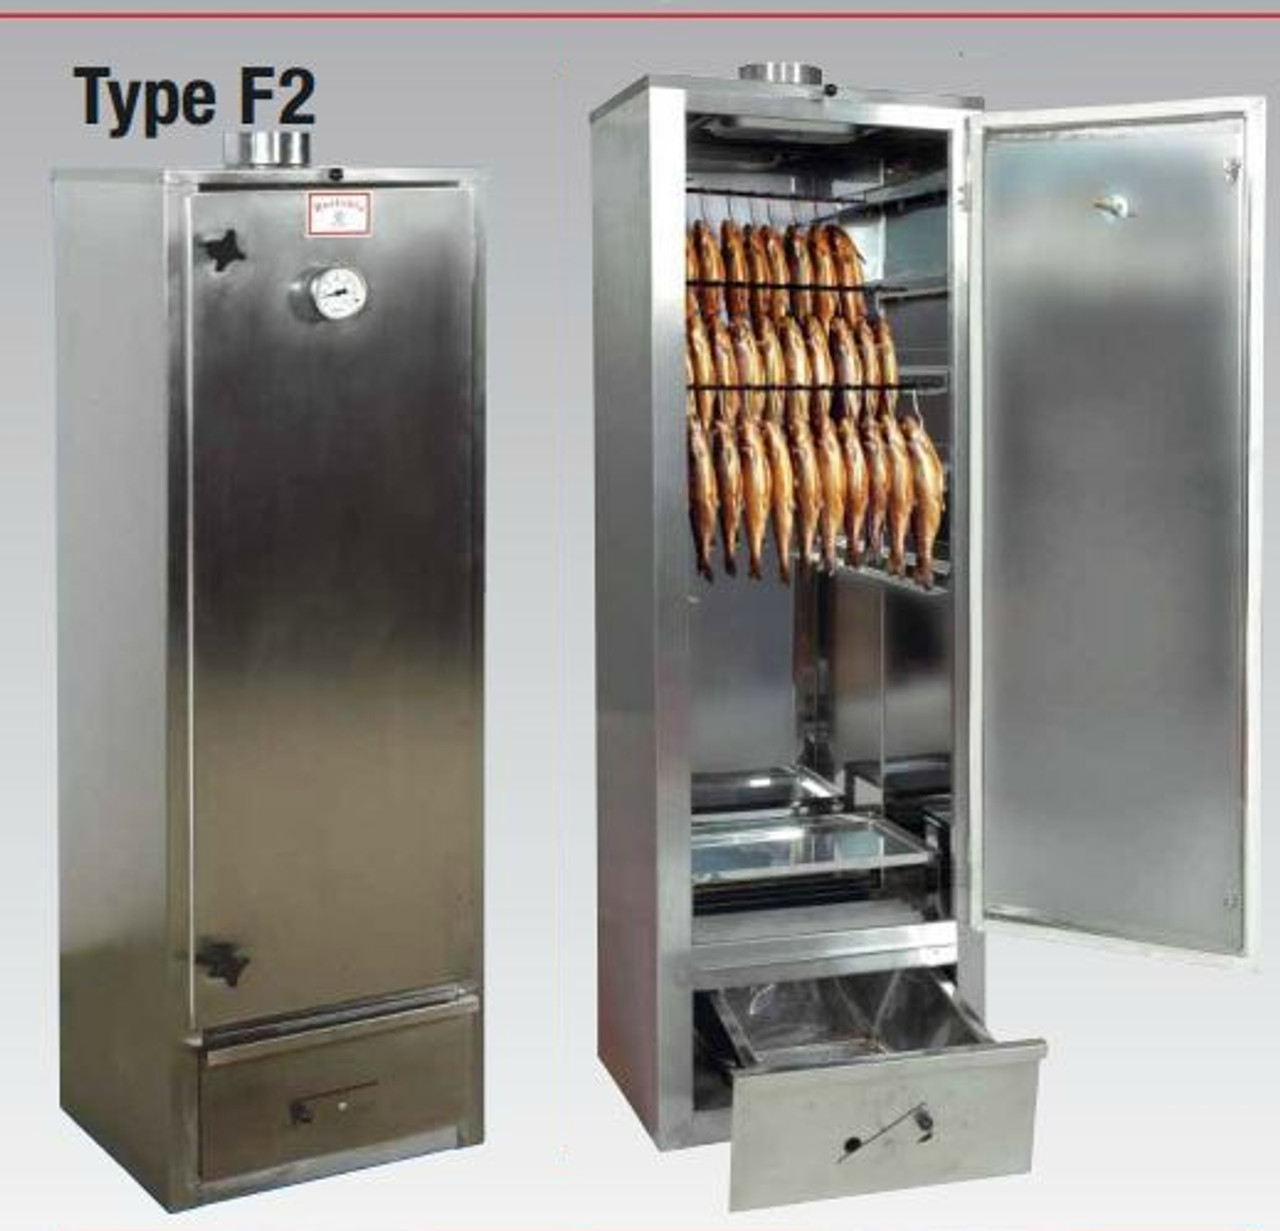 Beelonia F2 Smoking Oven - Wood Heated Smoker